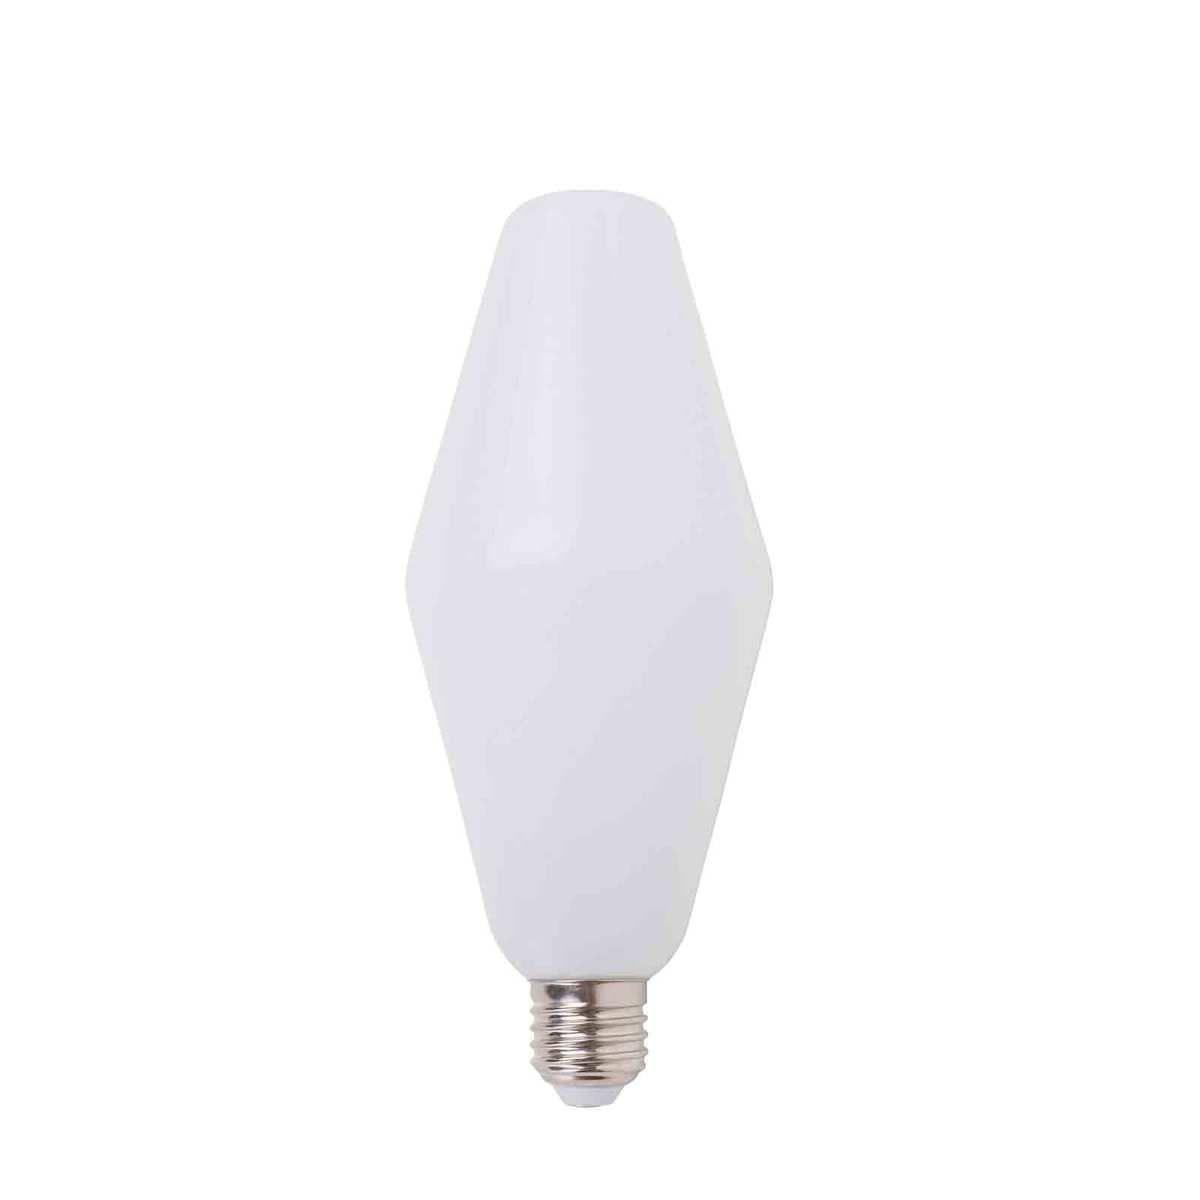 Airam WIR 85 LED bulb, dimmable | Finnish Design Shop | Bulb